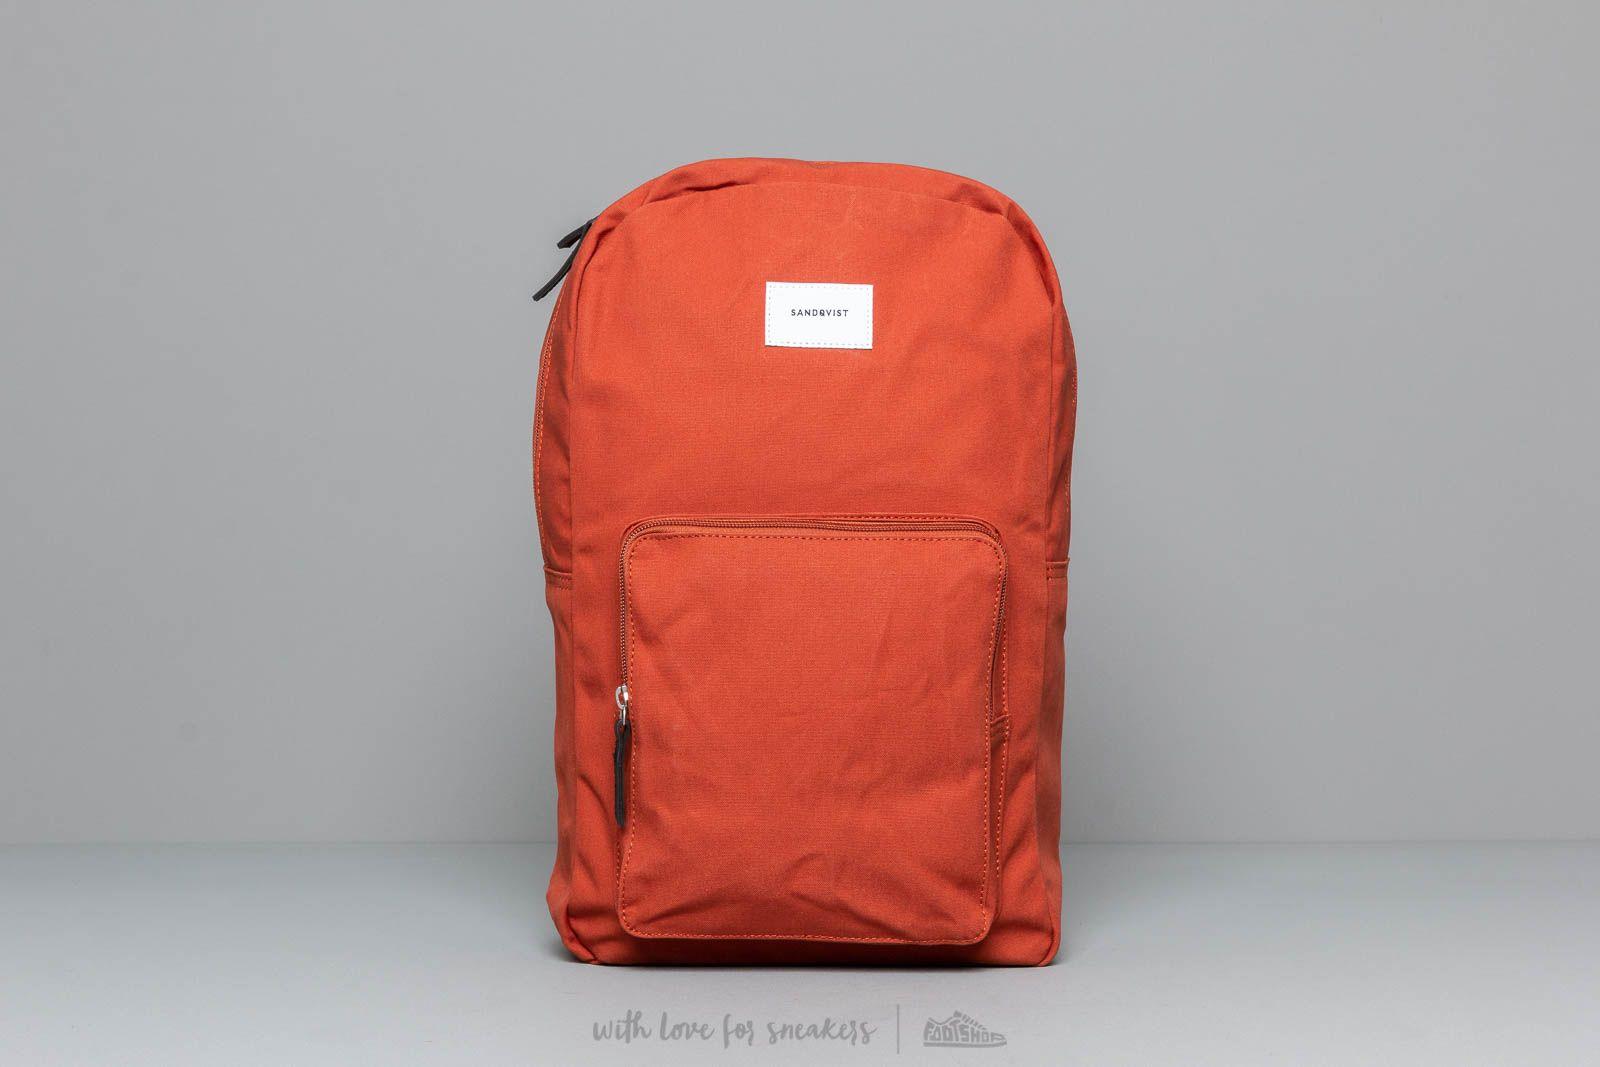 Sandqvist Ground Kim Laptop Backpack Rust za skvelú cenu 95 € kúpite na Footshop.sk